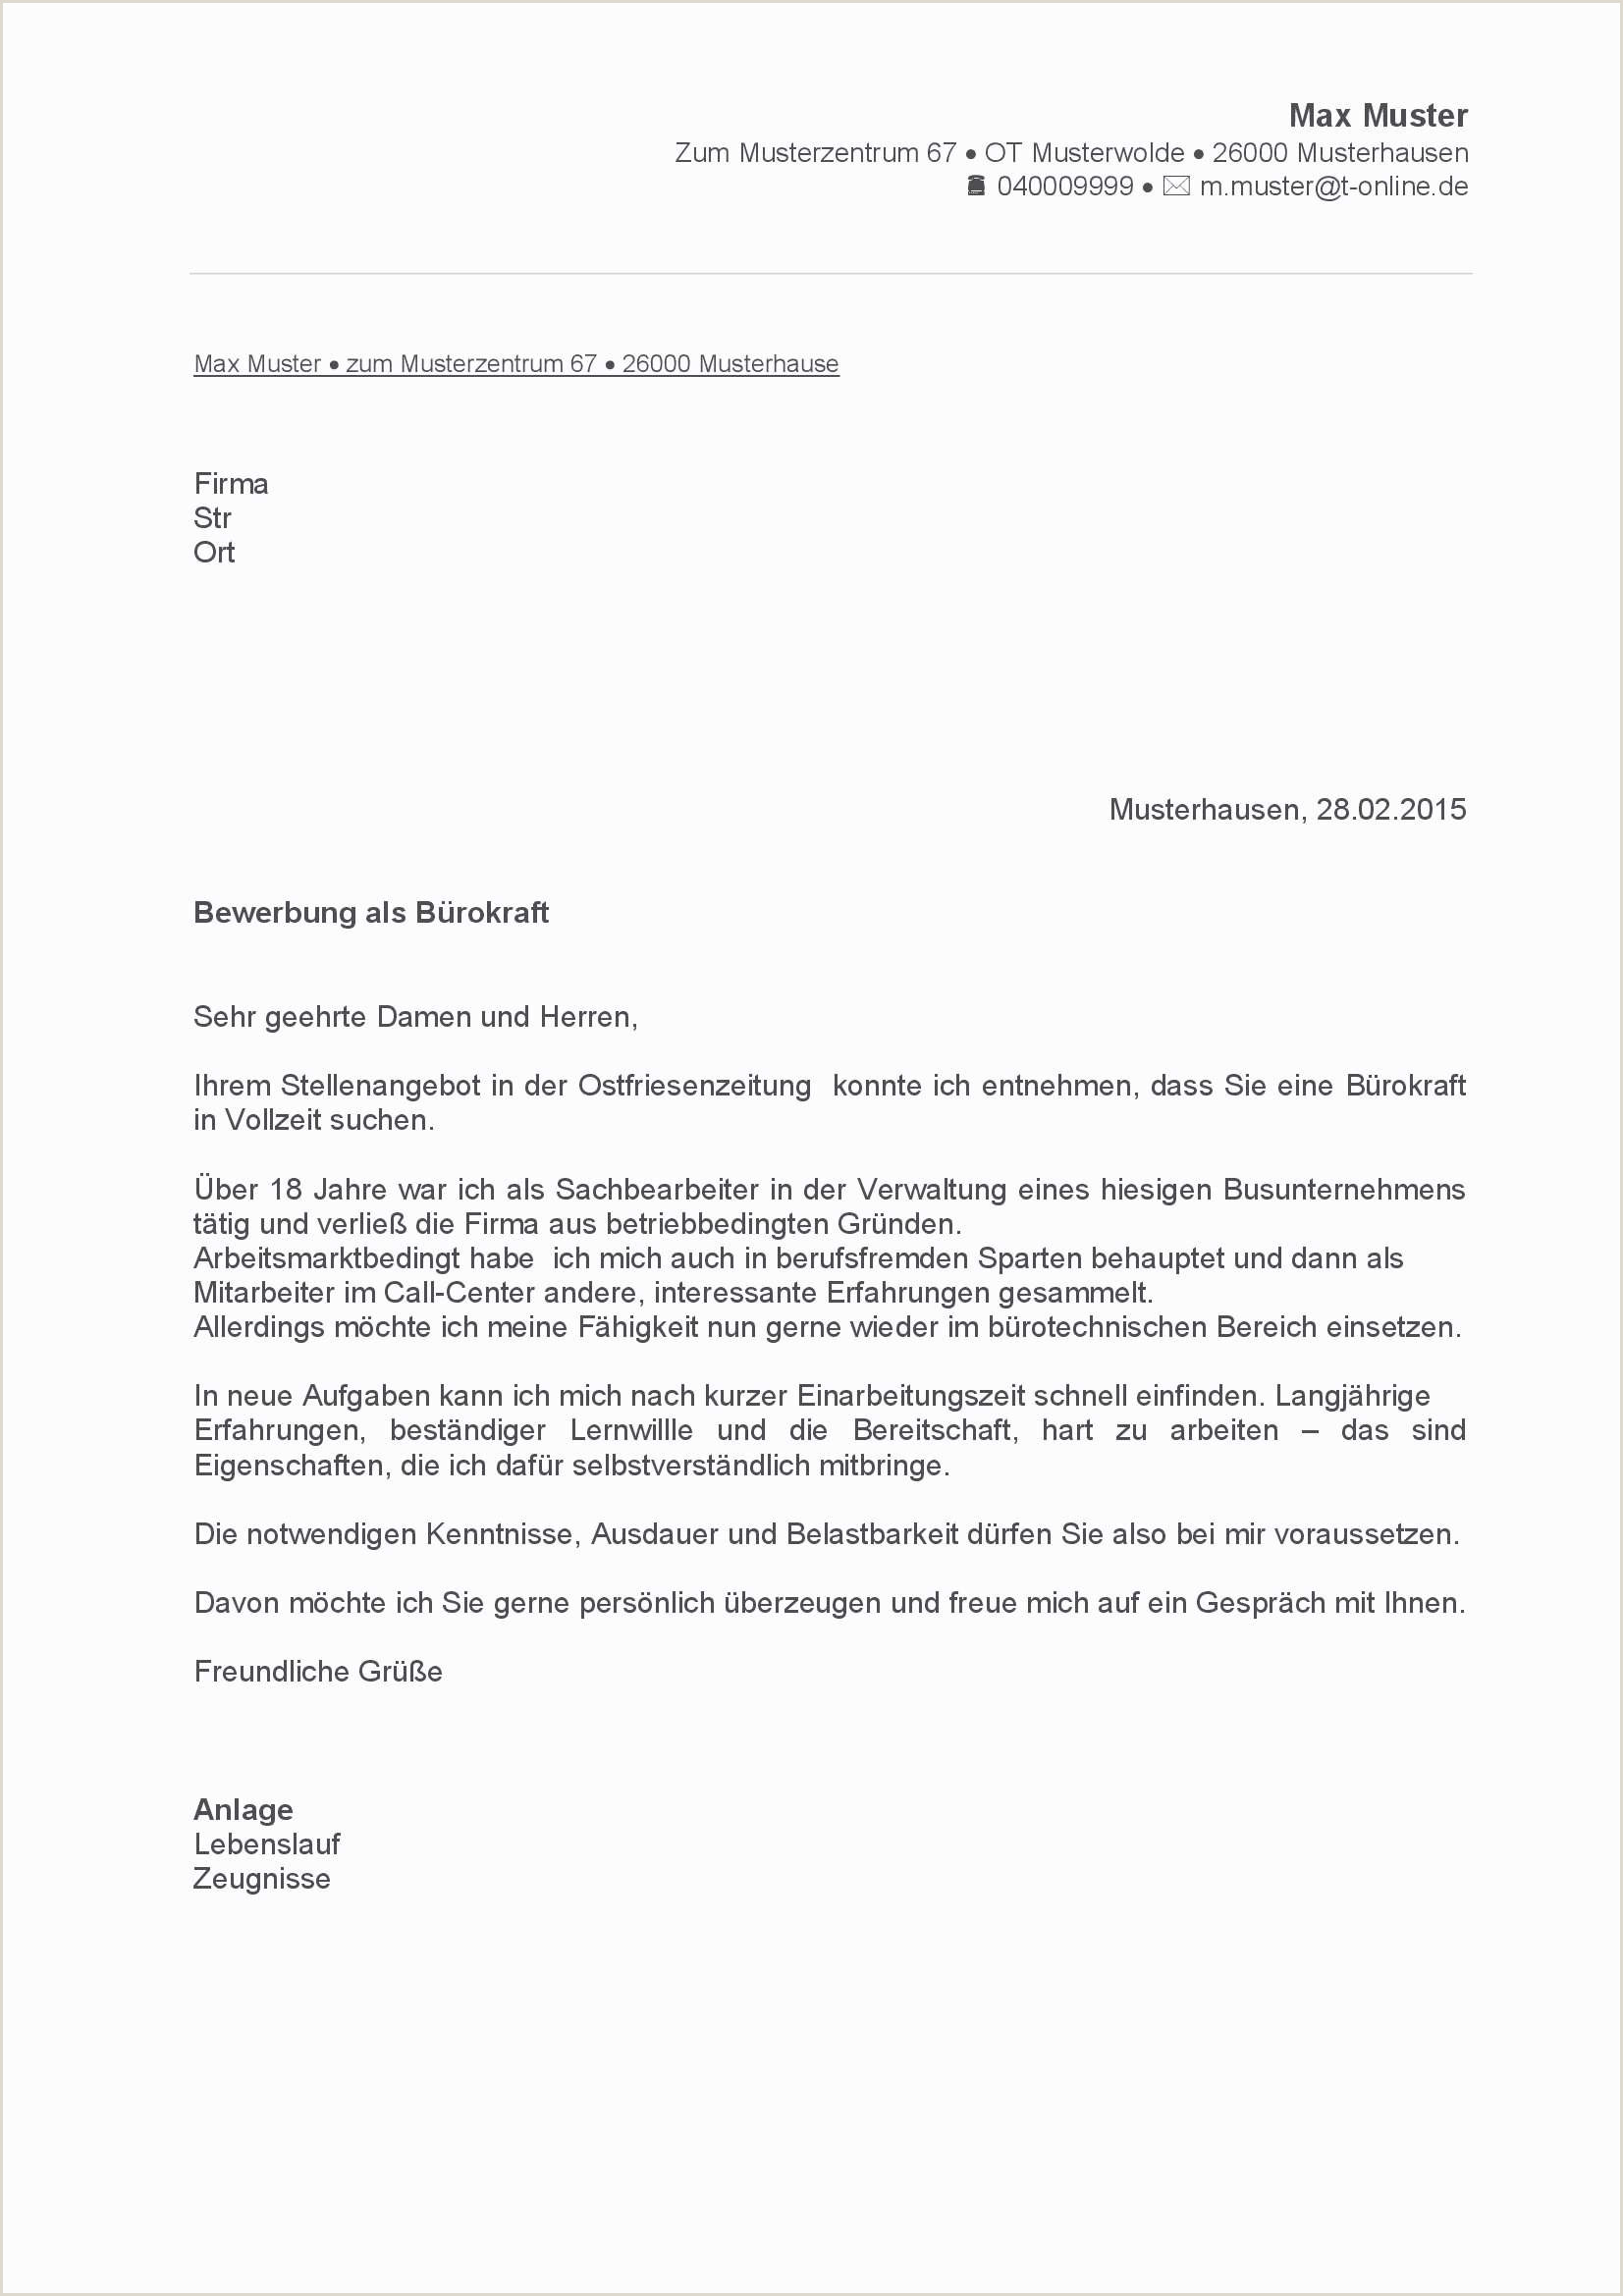 Ausformulierter Lebenslauf Muster Jura Briefbeschriftung 2019 01 15t14